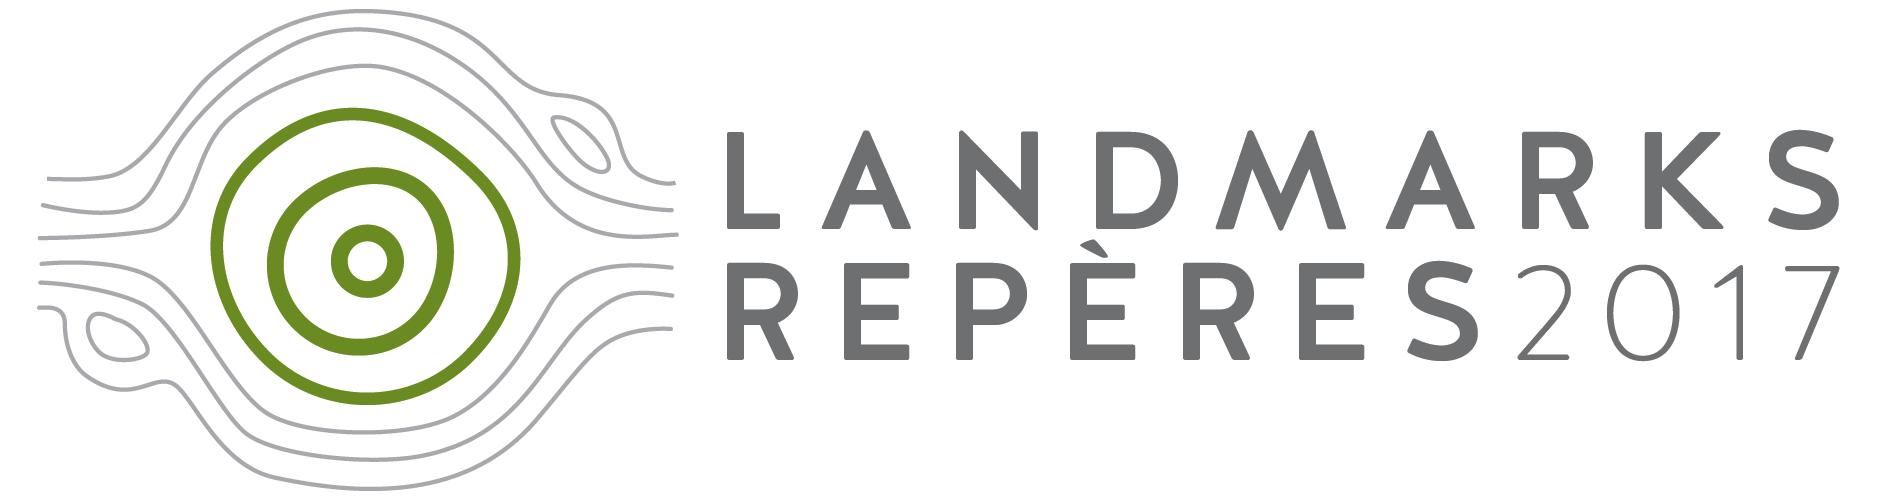 LANDMARKS2017 LOGO Eng copy.jpeg